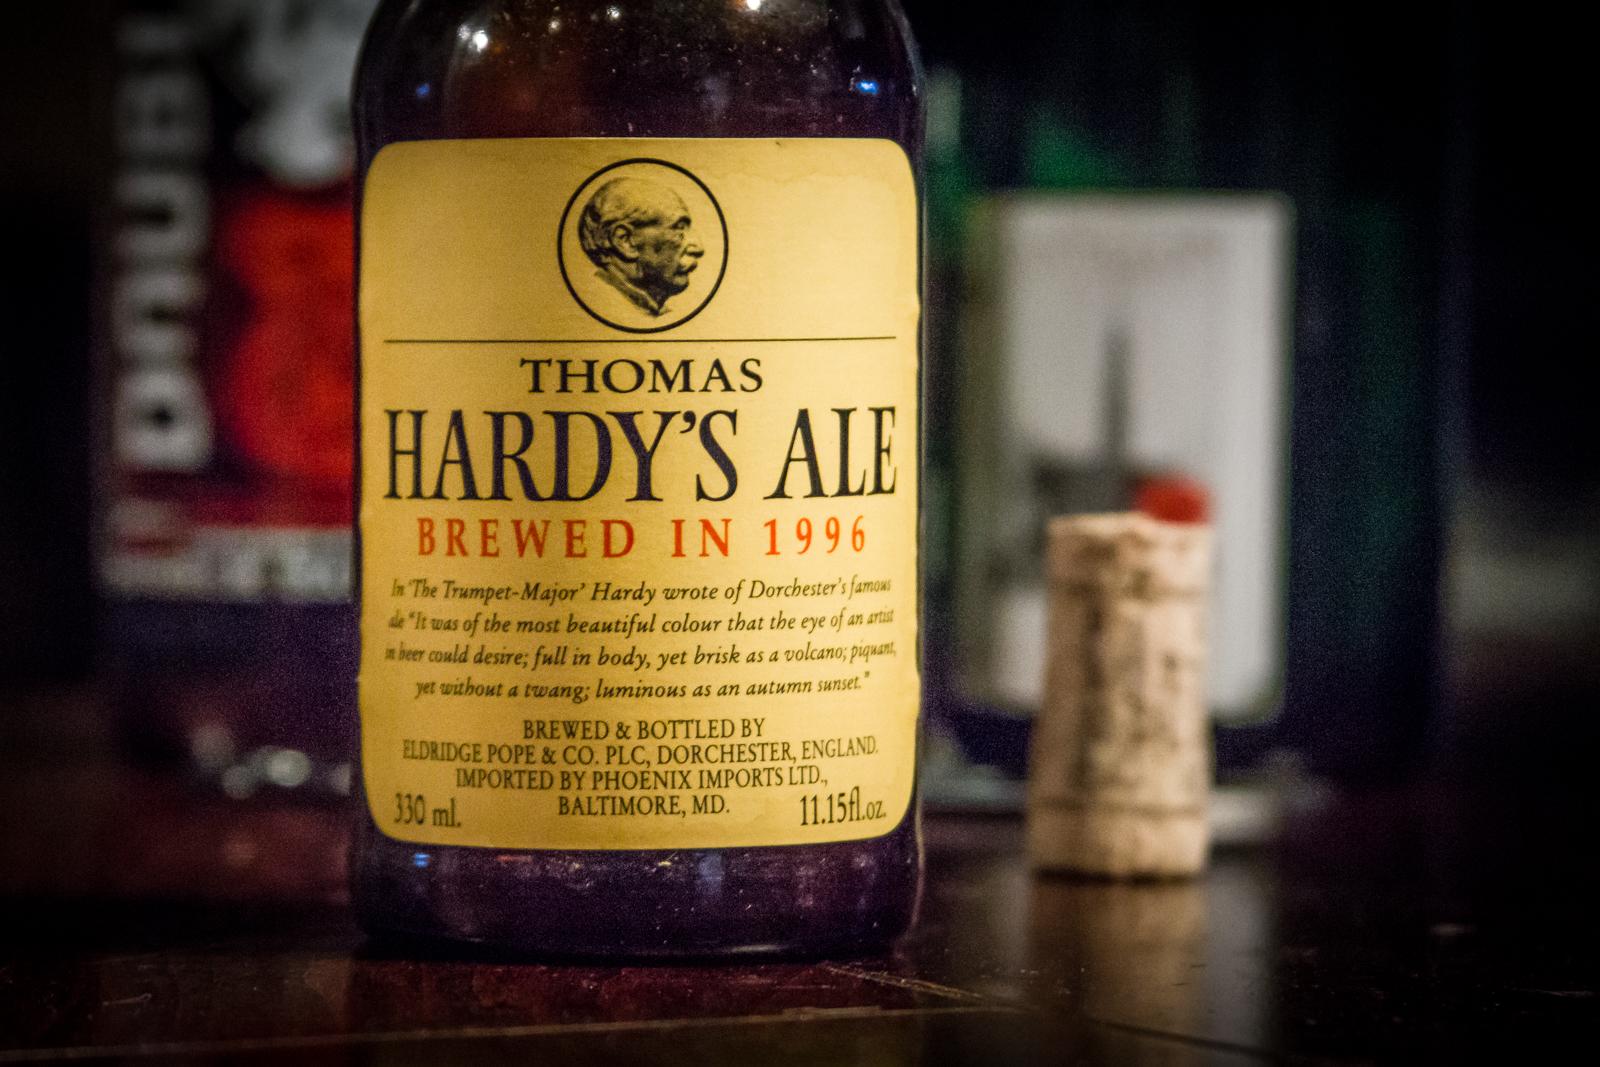 Thomas Hardy's Ale, Vintage 1996